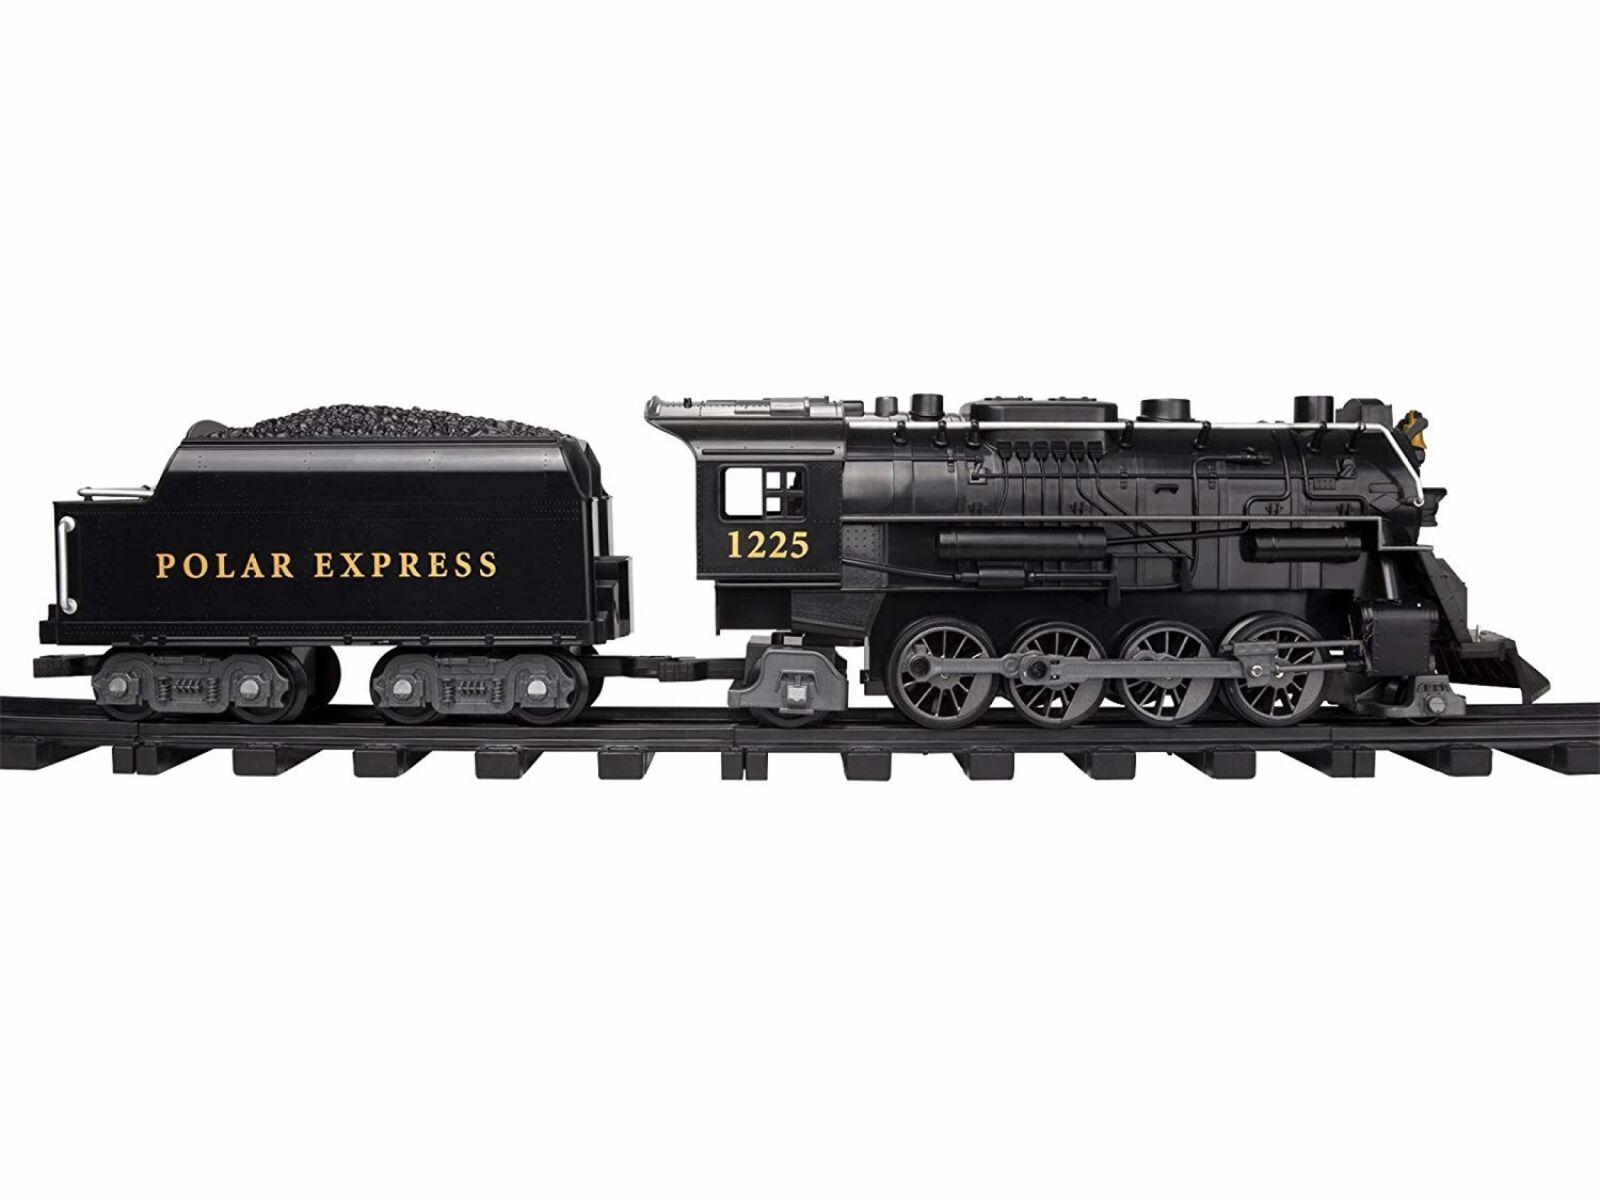 Christmas The Polar Express Train Locomotive Railway Set Toy Remote Remote Remote Control Gift 99e9a9